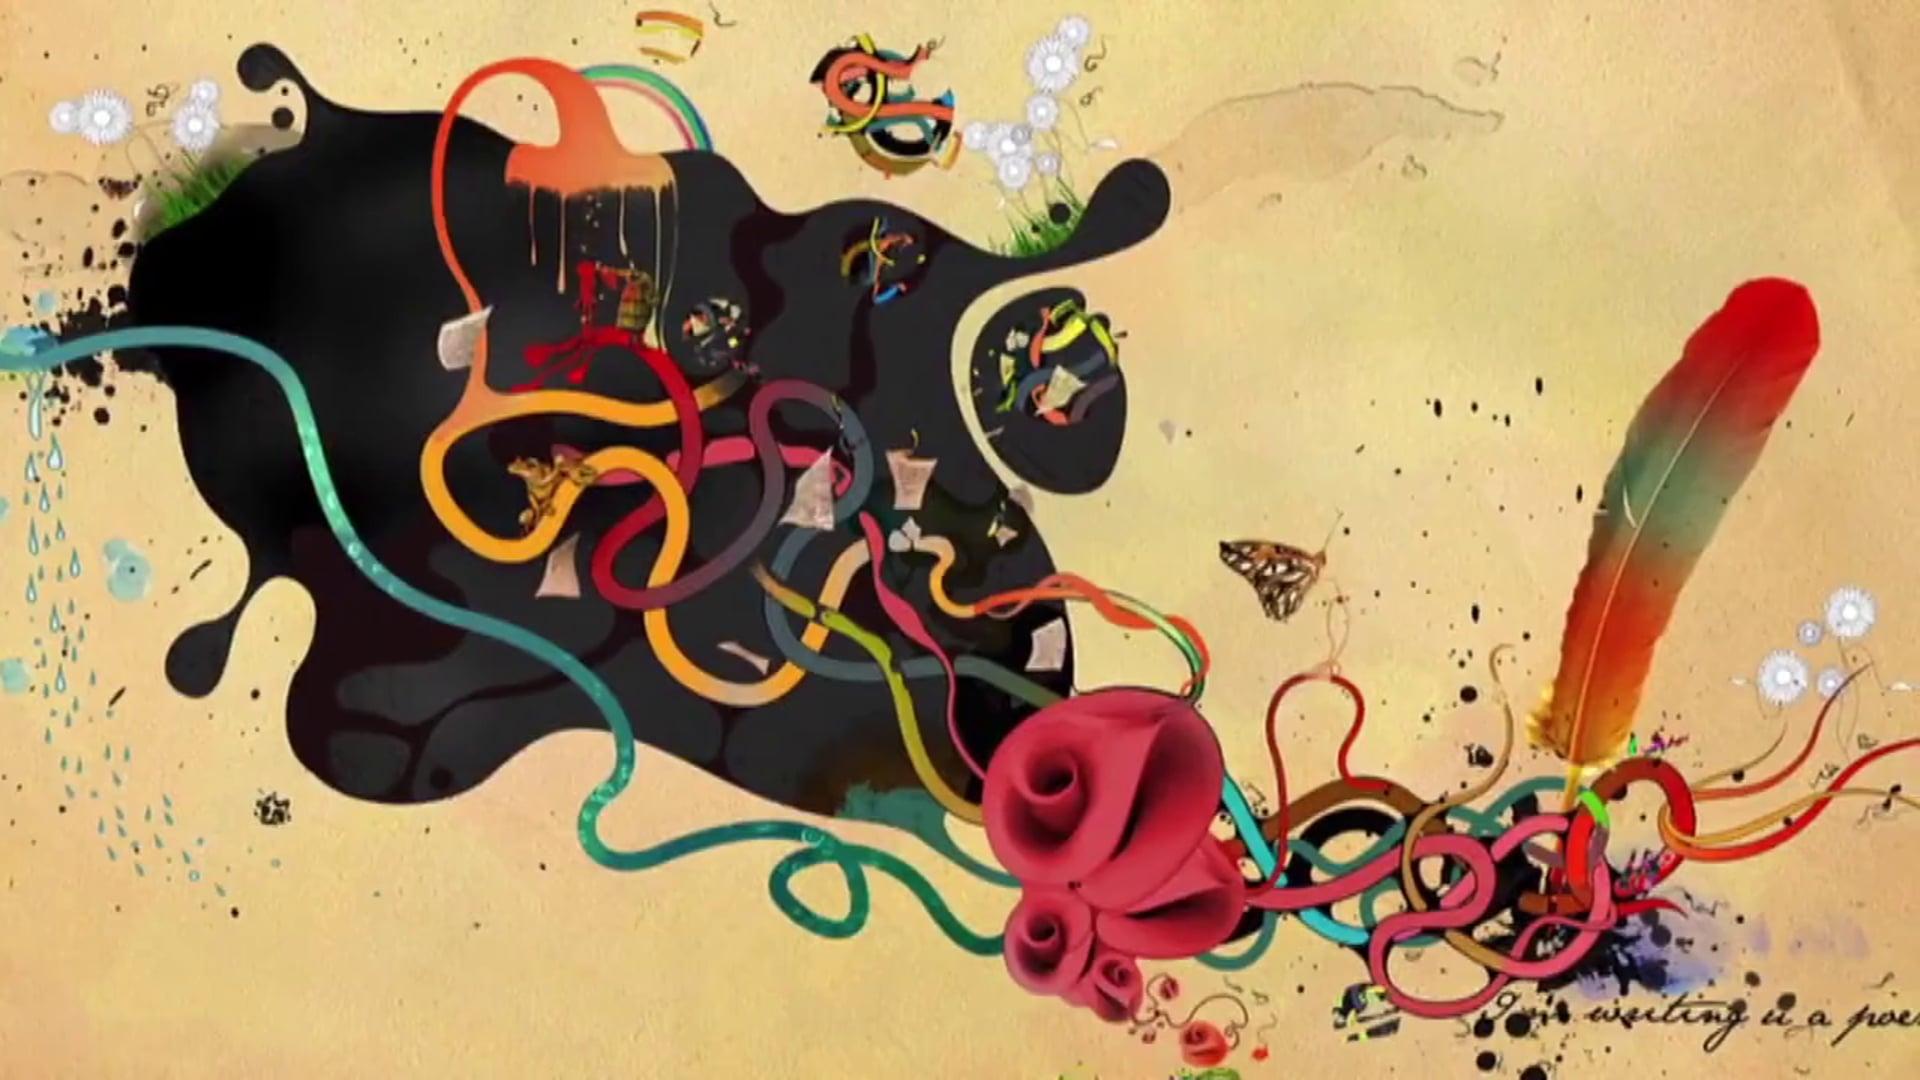 Digital Campaign: Spark Art